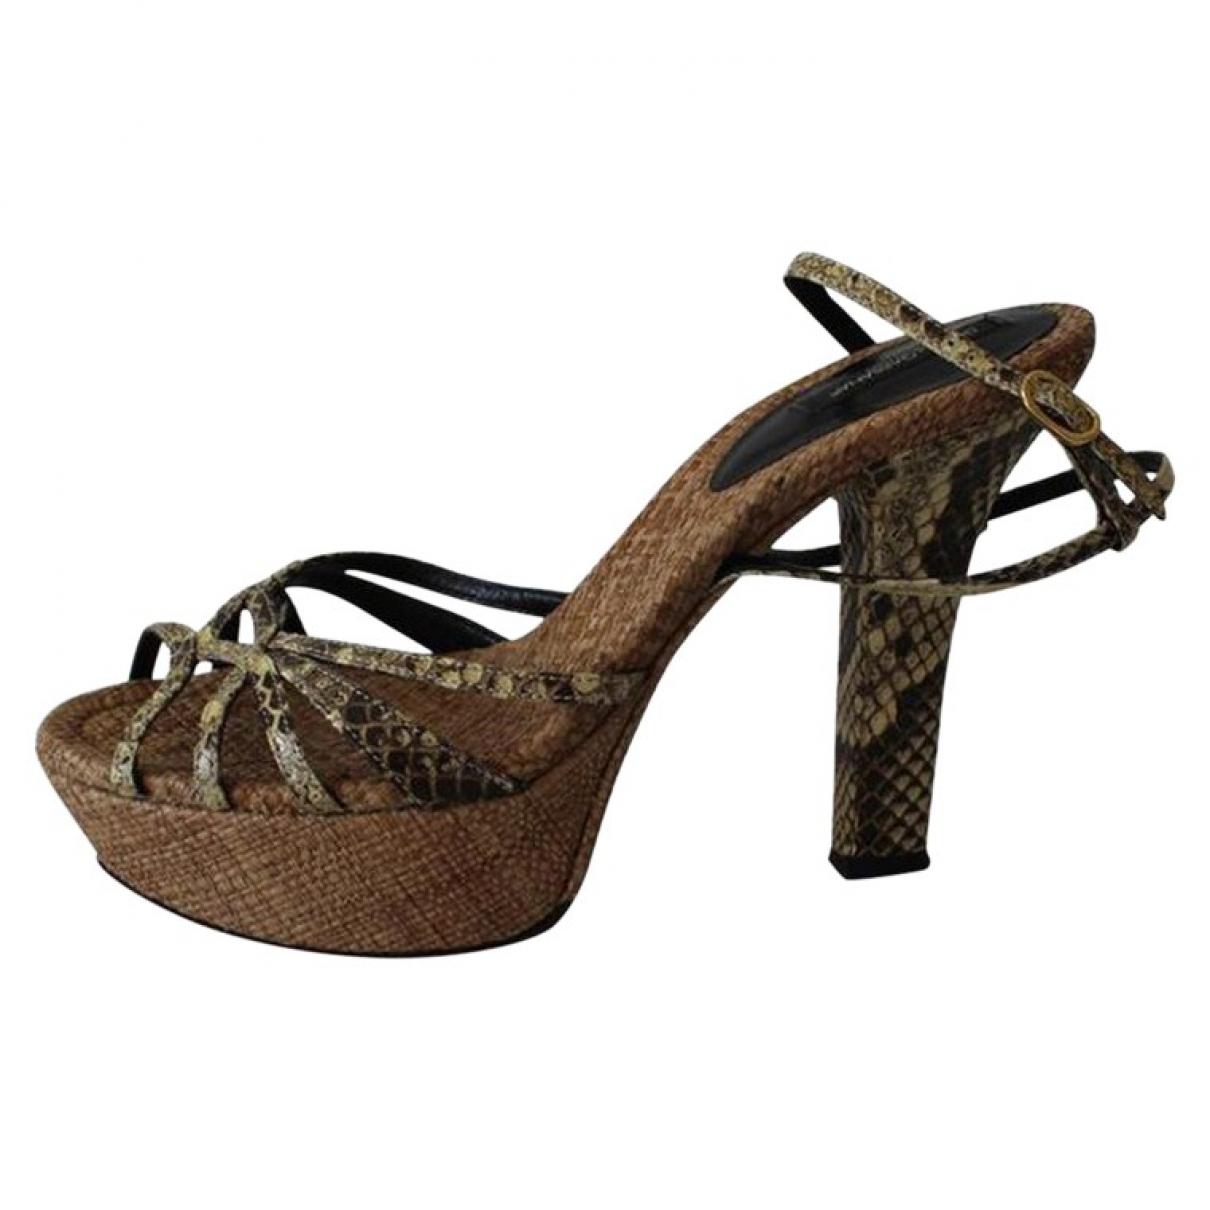 Dolce & Gabbana \N Beige Python Sandals for Women 39 EU